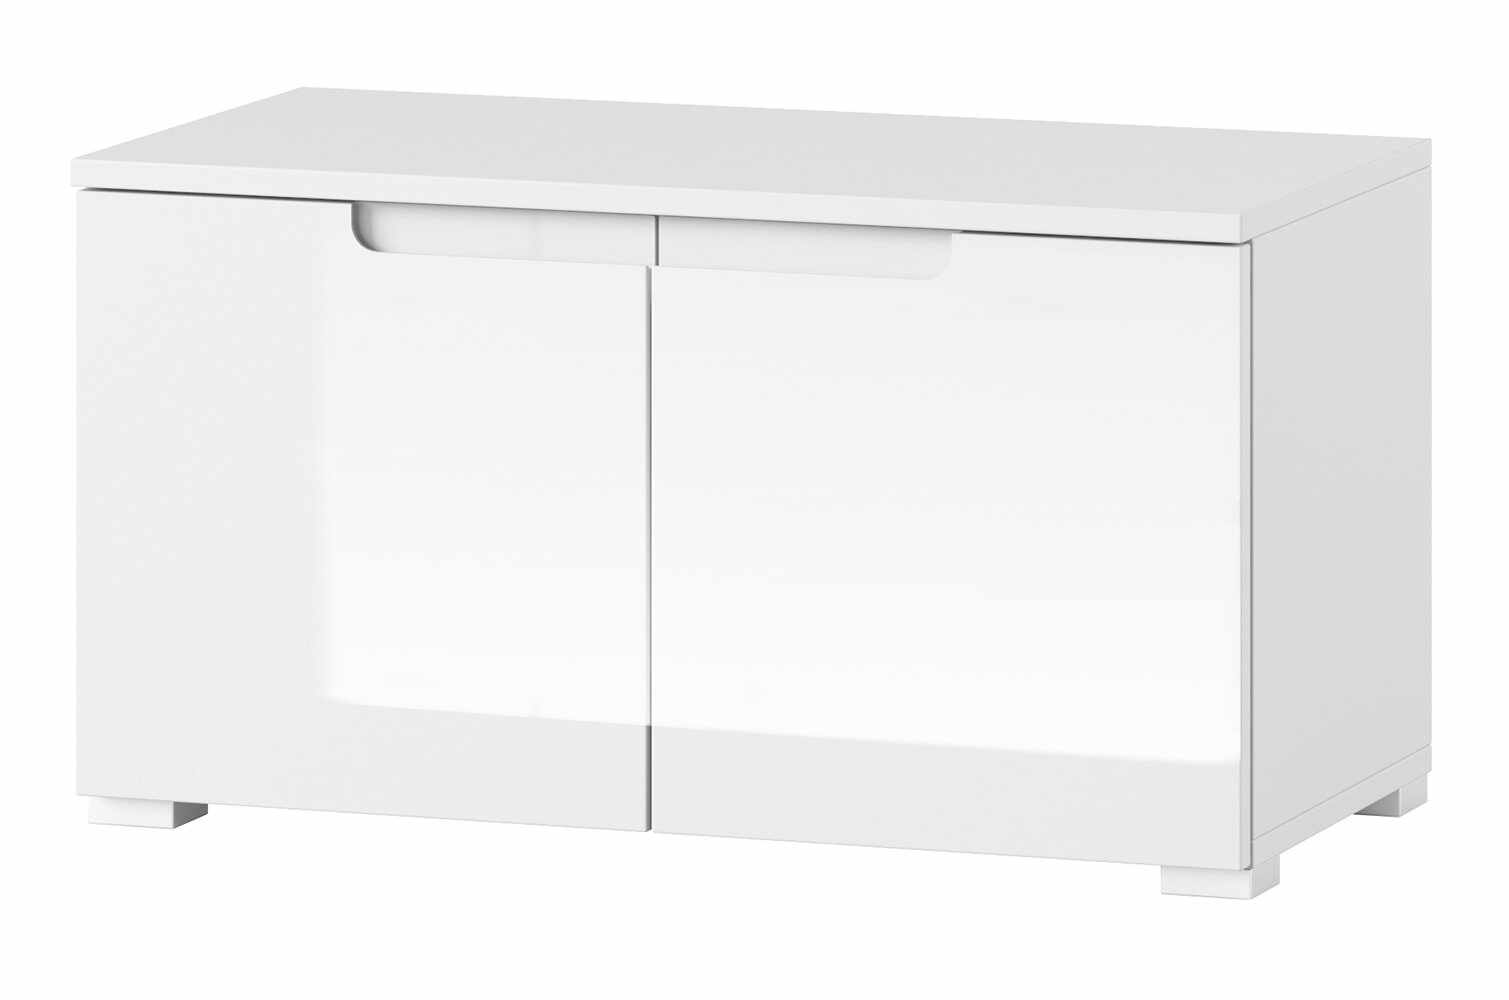 Cabinet din pal si MDF cu 2 usi Small Gabrielle 18 Alb, l79xA40xH43 cm la pret 419 lei